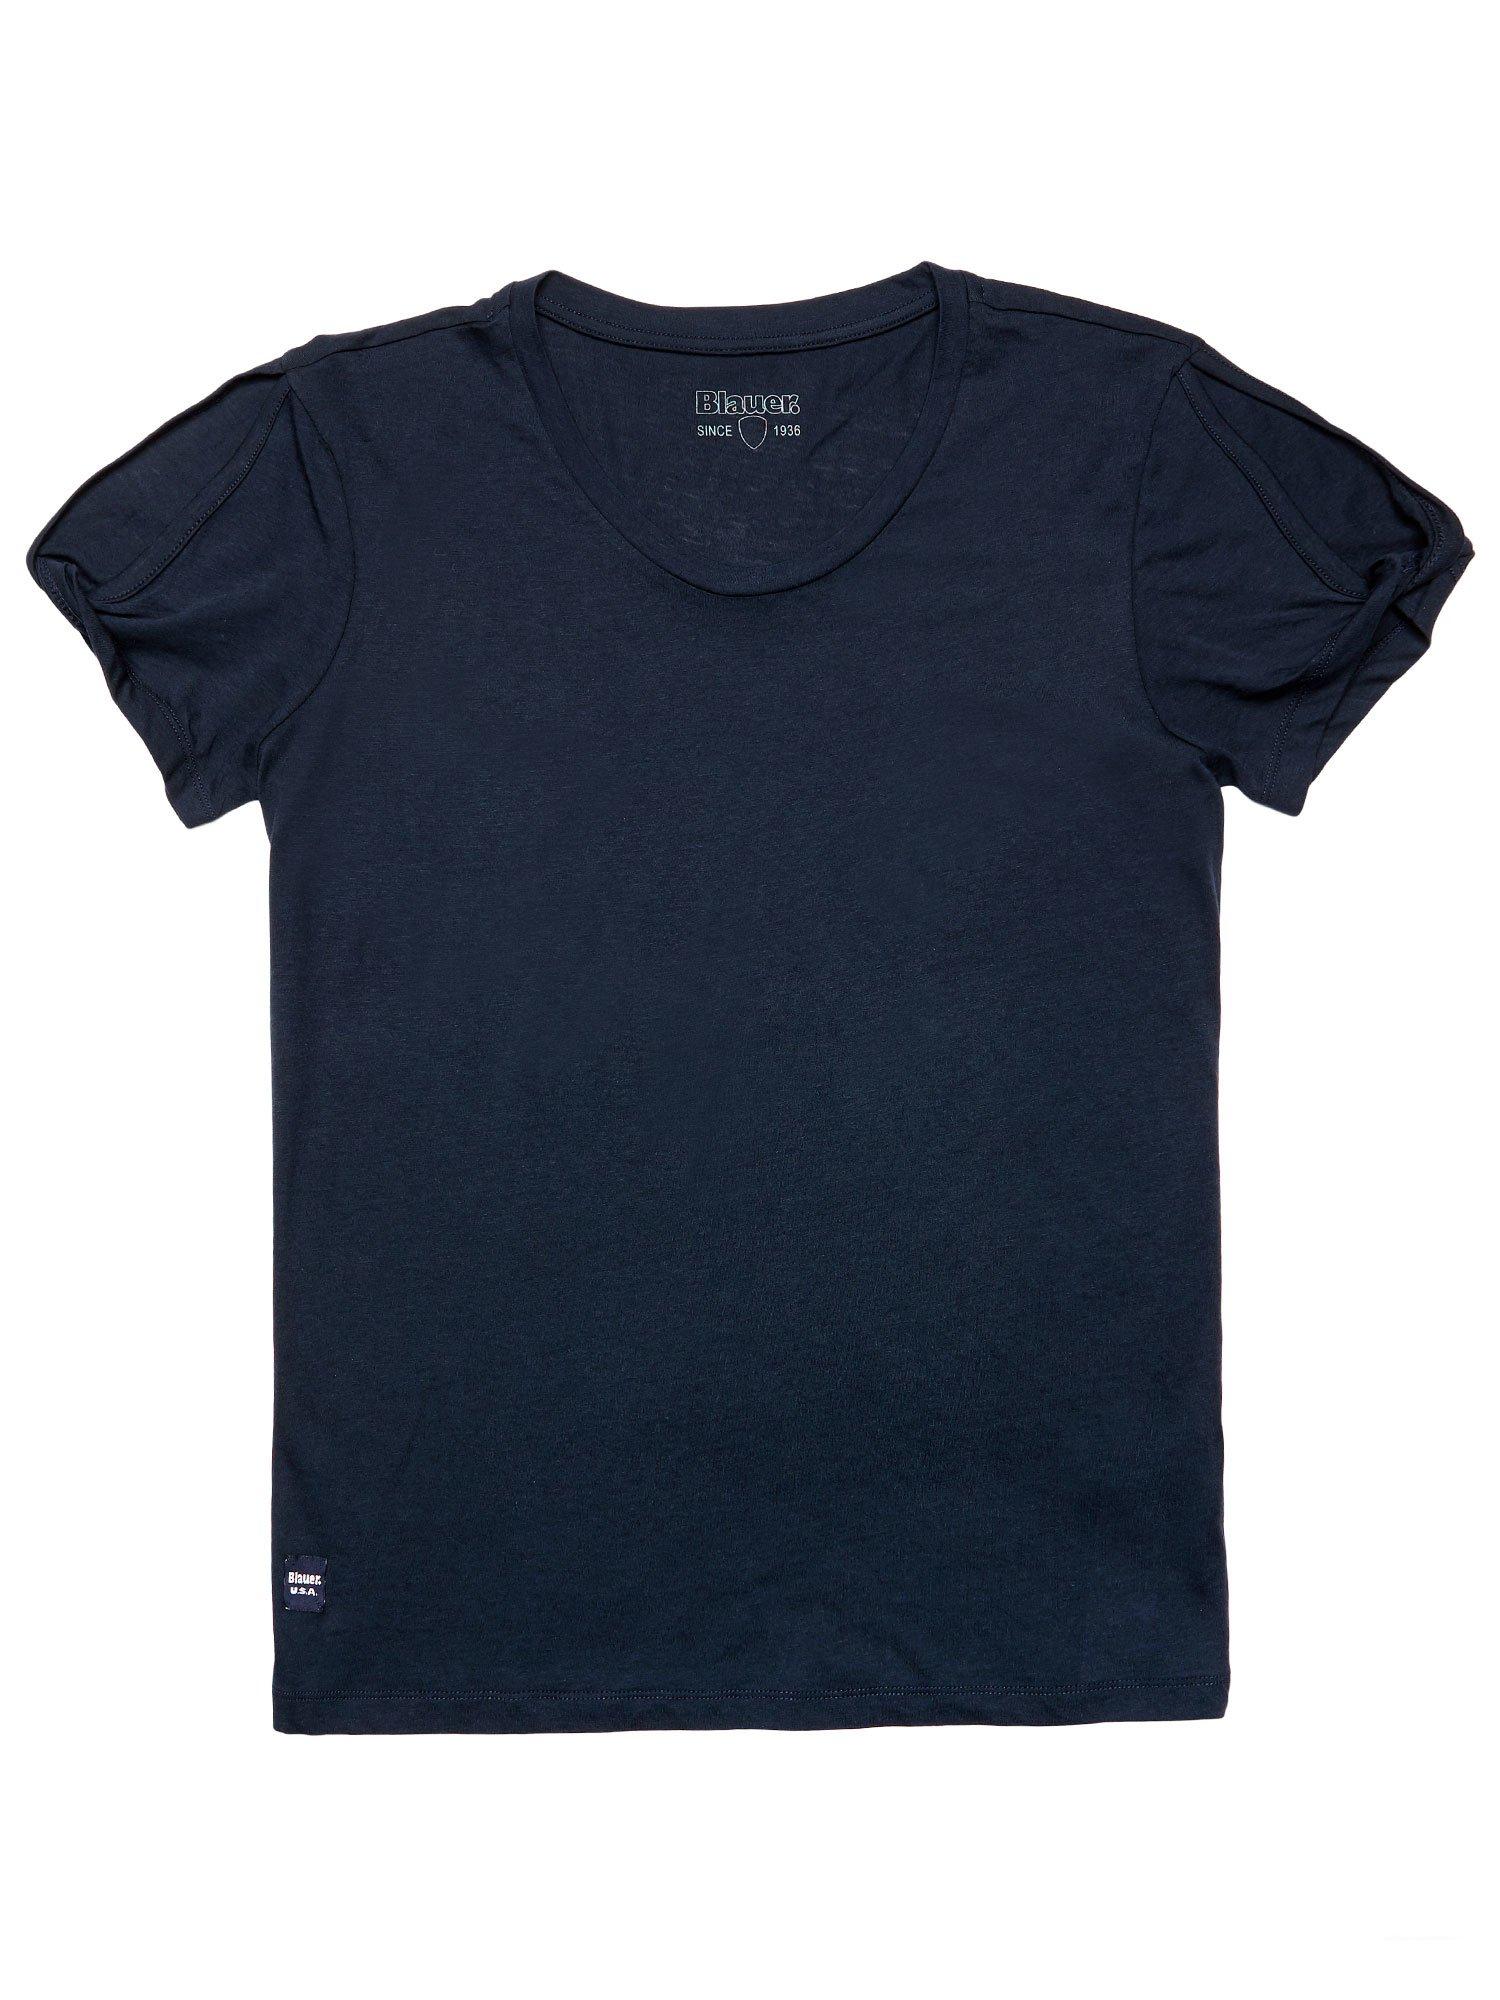 Blauer - CUT OUT COTTON MODAL T-SHIRT - Dark Night Blue - Blauer